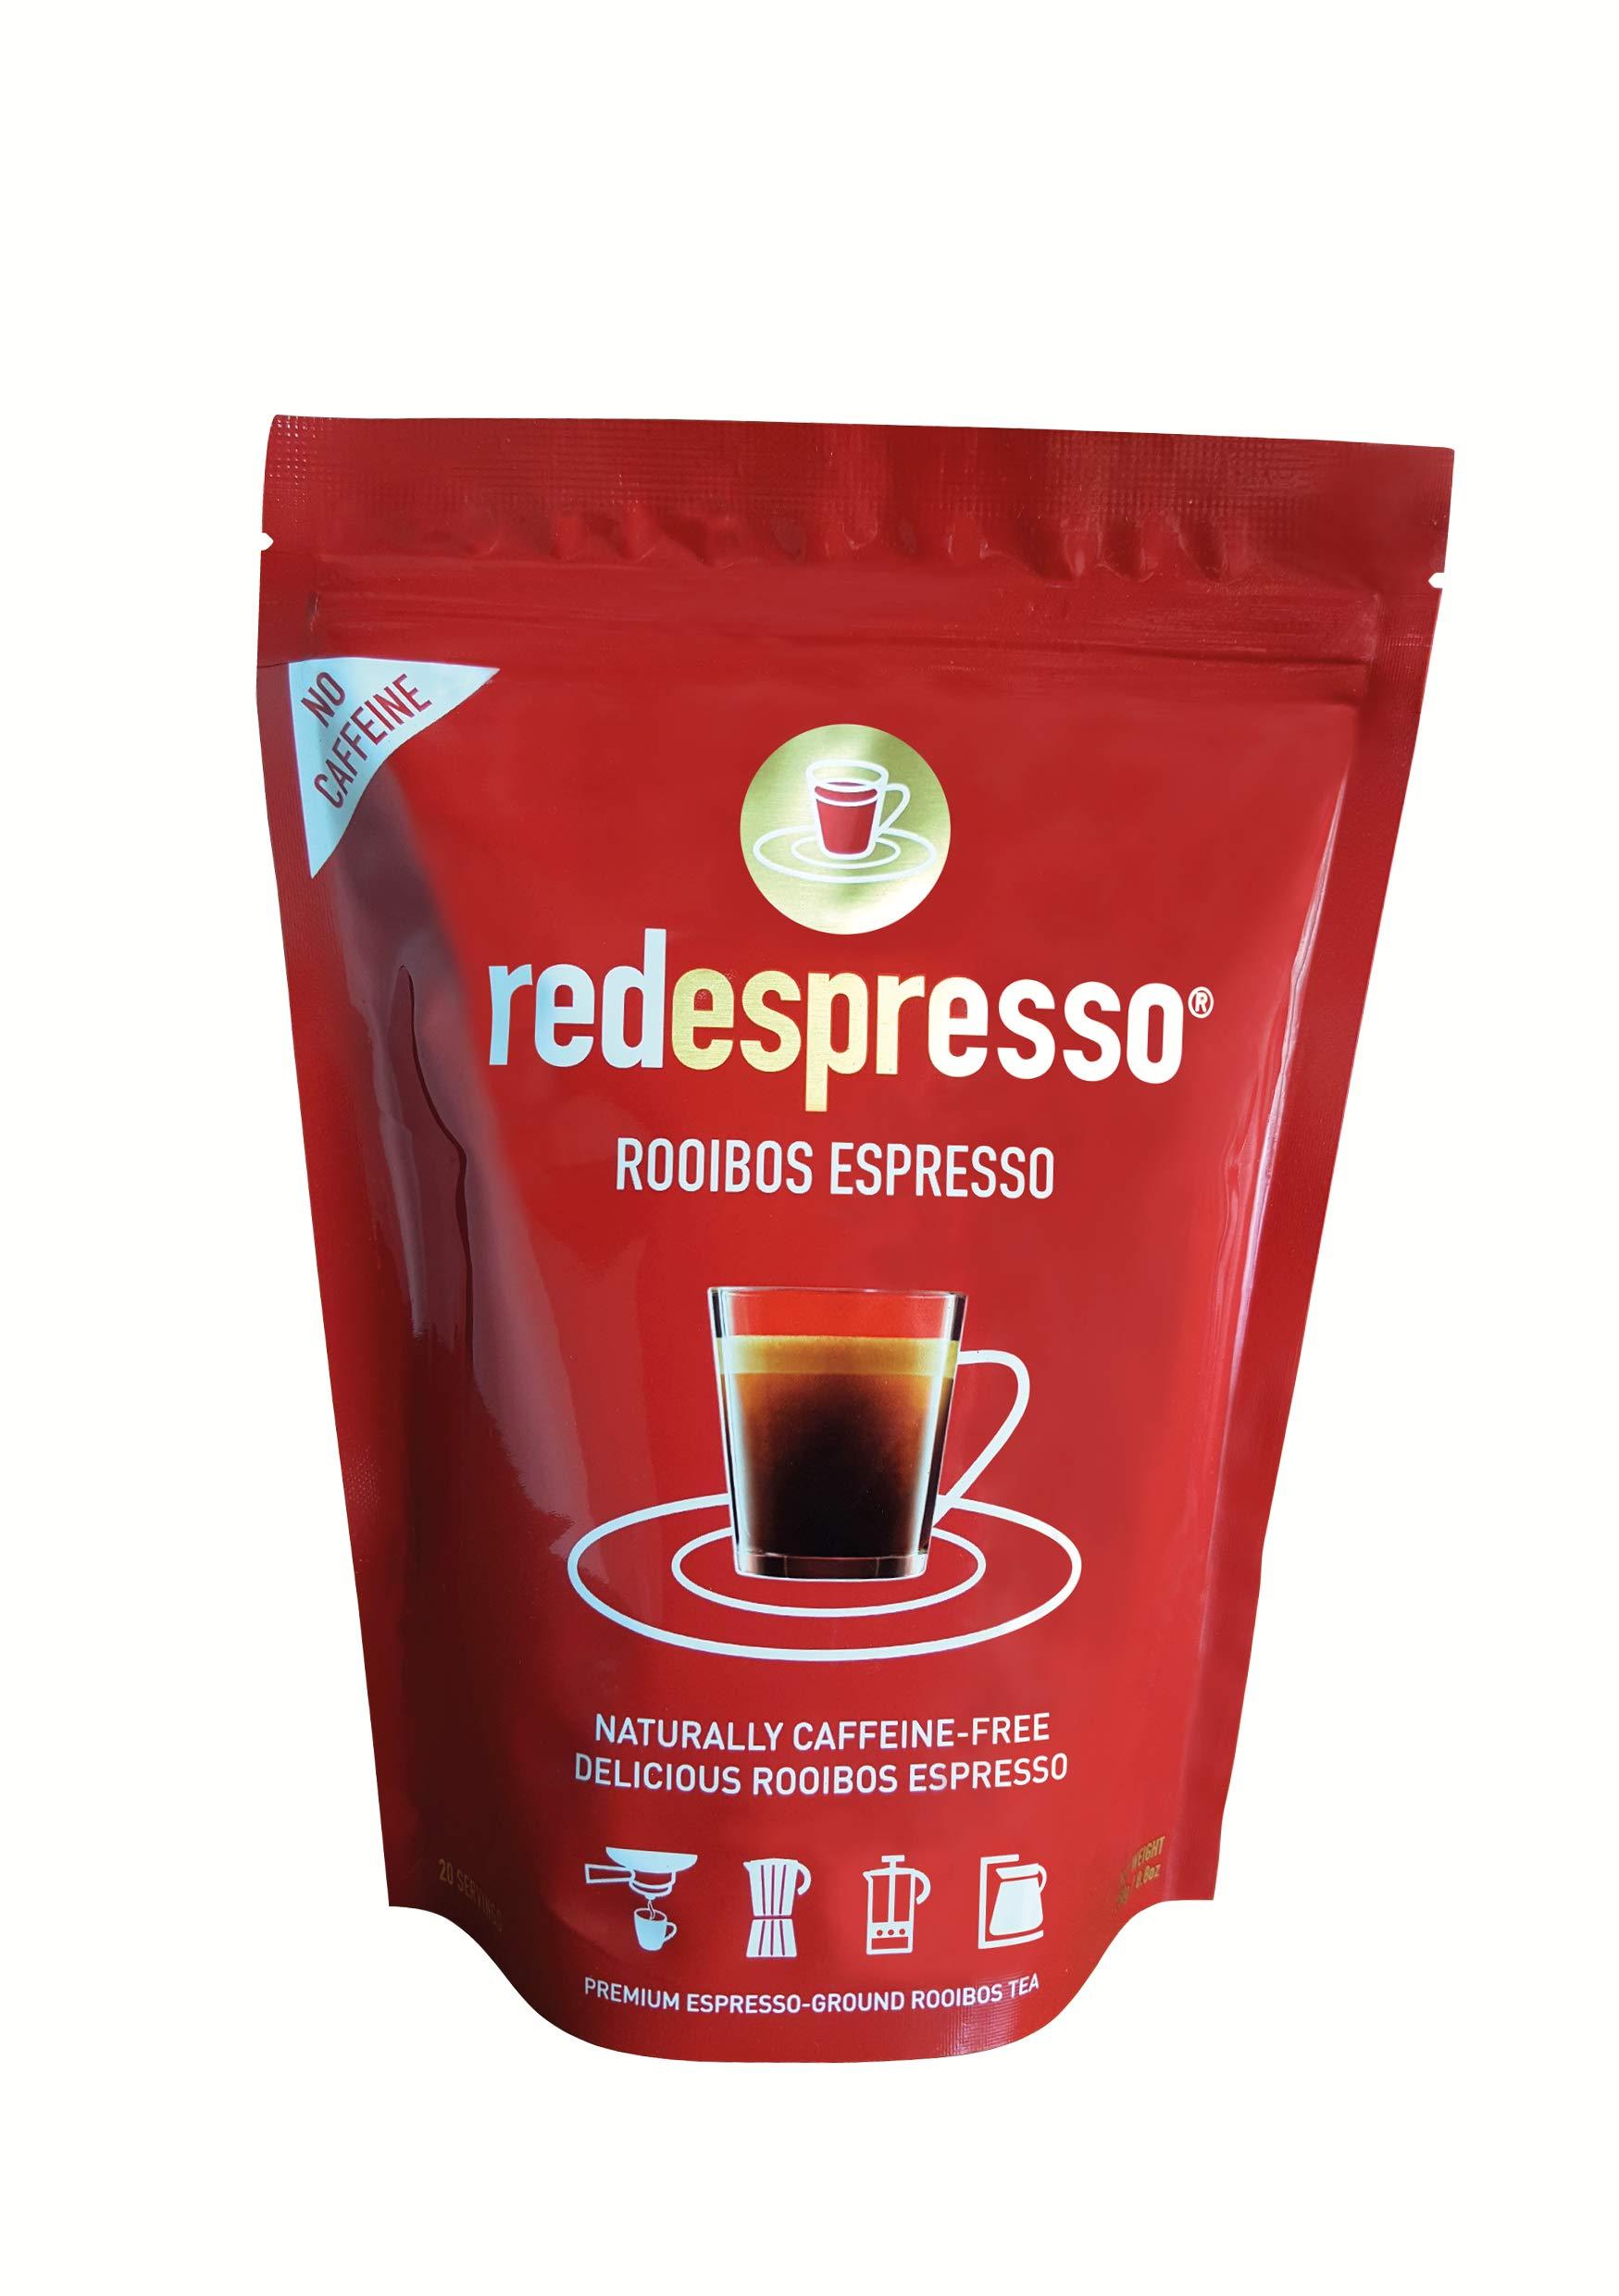 Red Espresso Rooibos - Red Tea - South African - 250g (8.8oz) Ground - Vegan, Non GMO, Antioxidant, Caffeine-Free, Allergy Friendly, Kosher, Organic (8.8oz (250g))